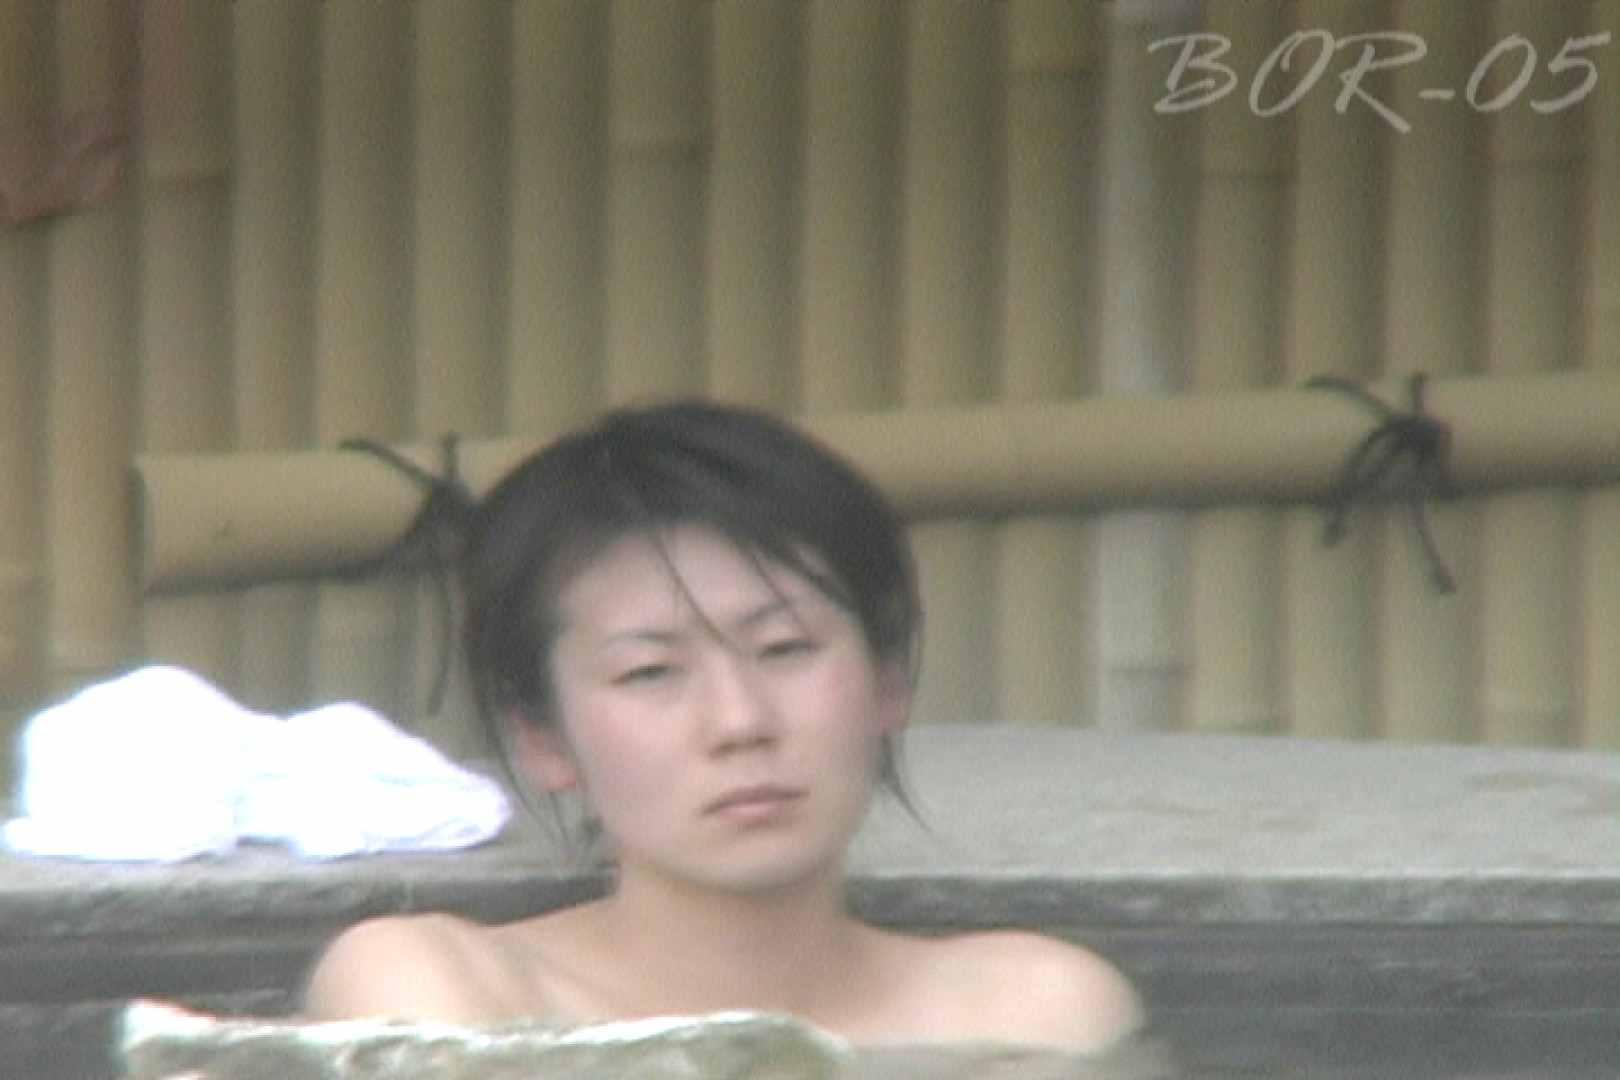 Aquaな露天風呂Vol.493 盗撮 AV無料動画キャプチャ 67PICs 38